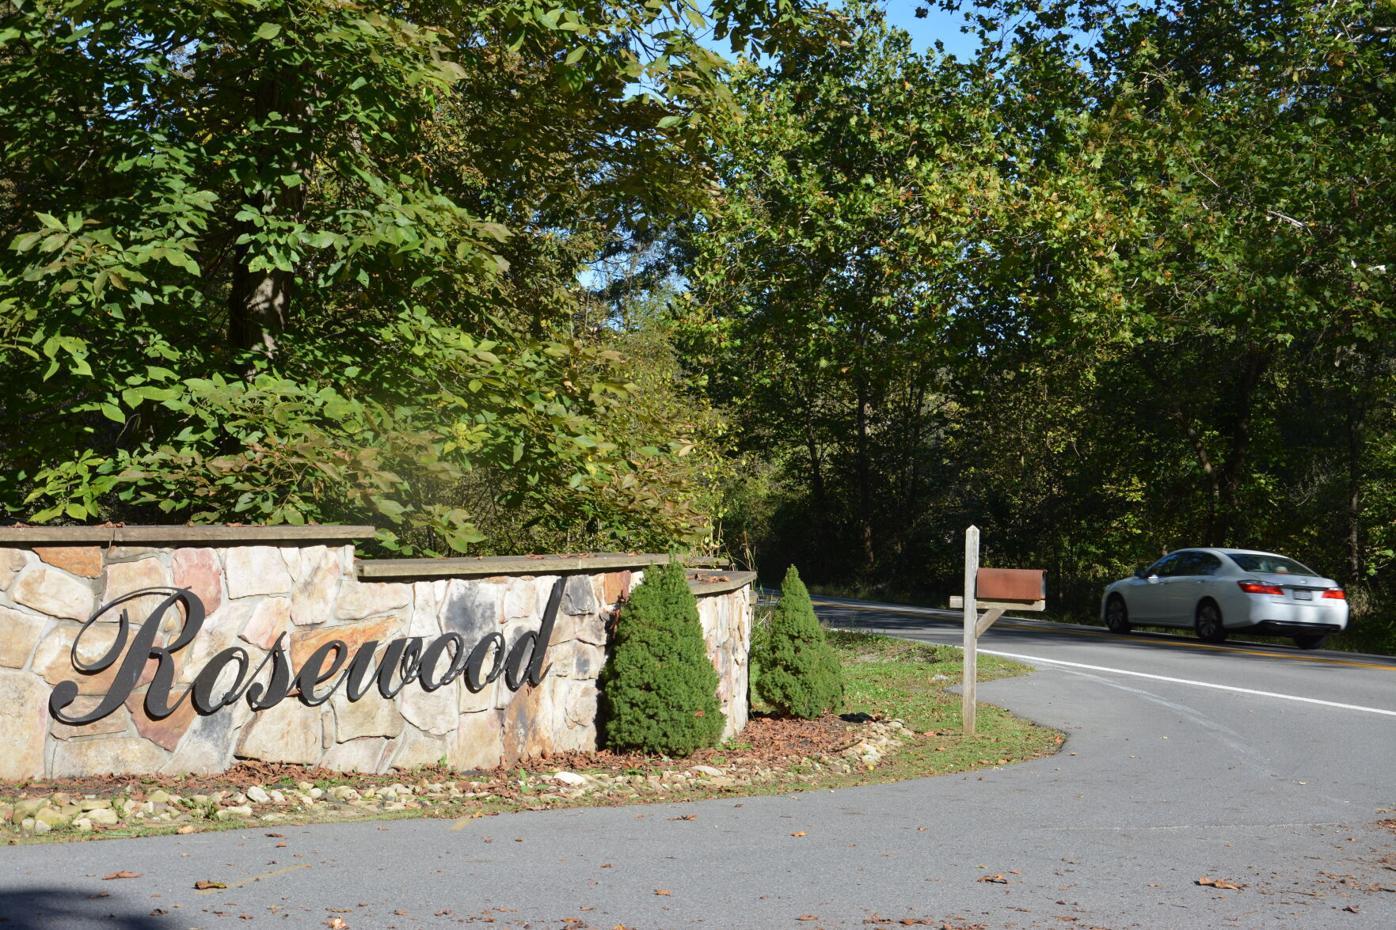 Rosewood entrance